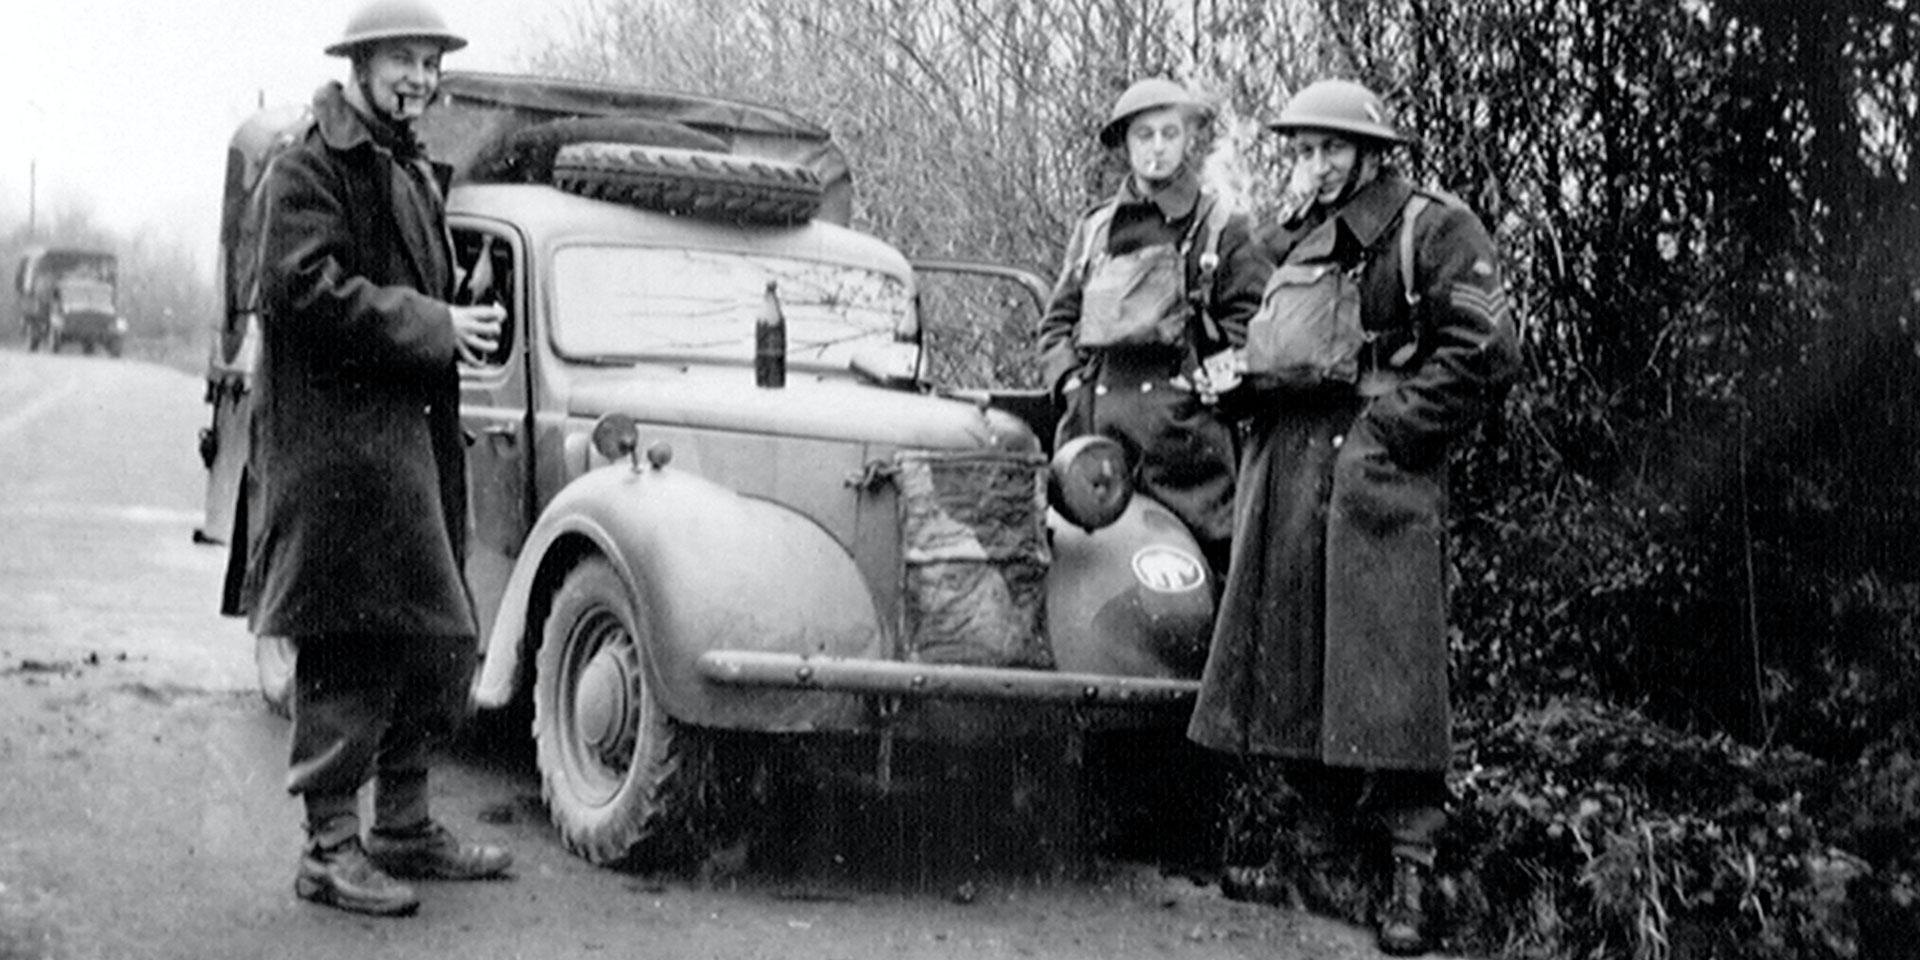 'Halt in the echelon', Austin 10 light utility truck, 3rd County of London Yeomanry (Sharpshooters), Chidingfold, Surrey, 1940